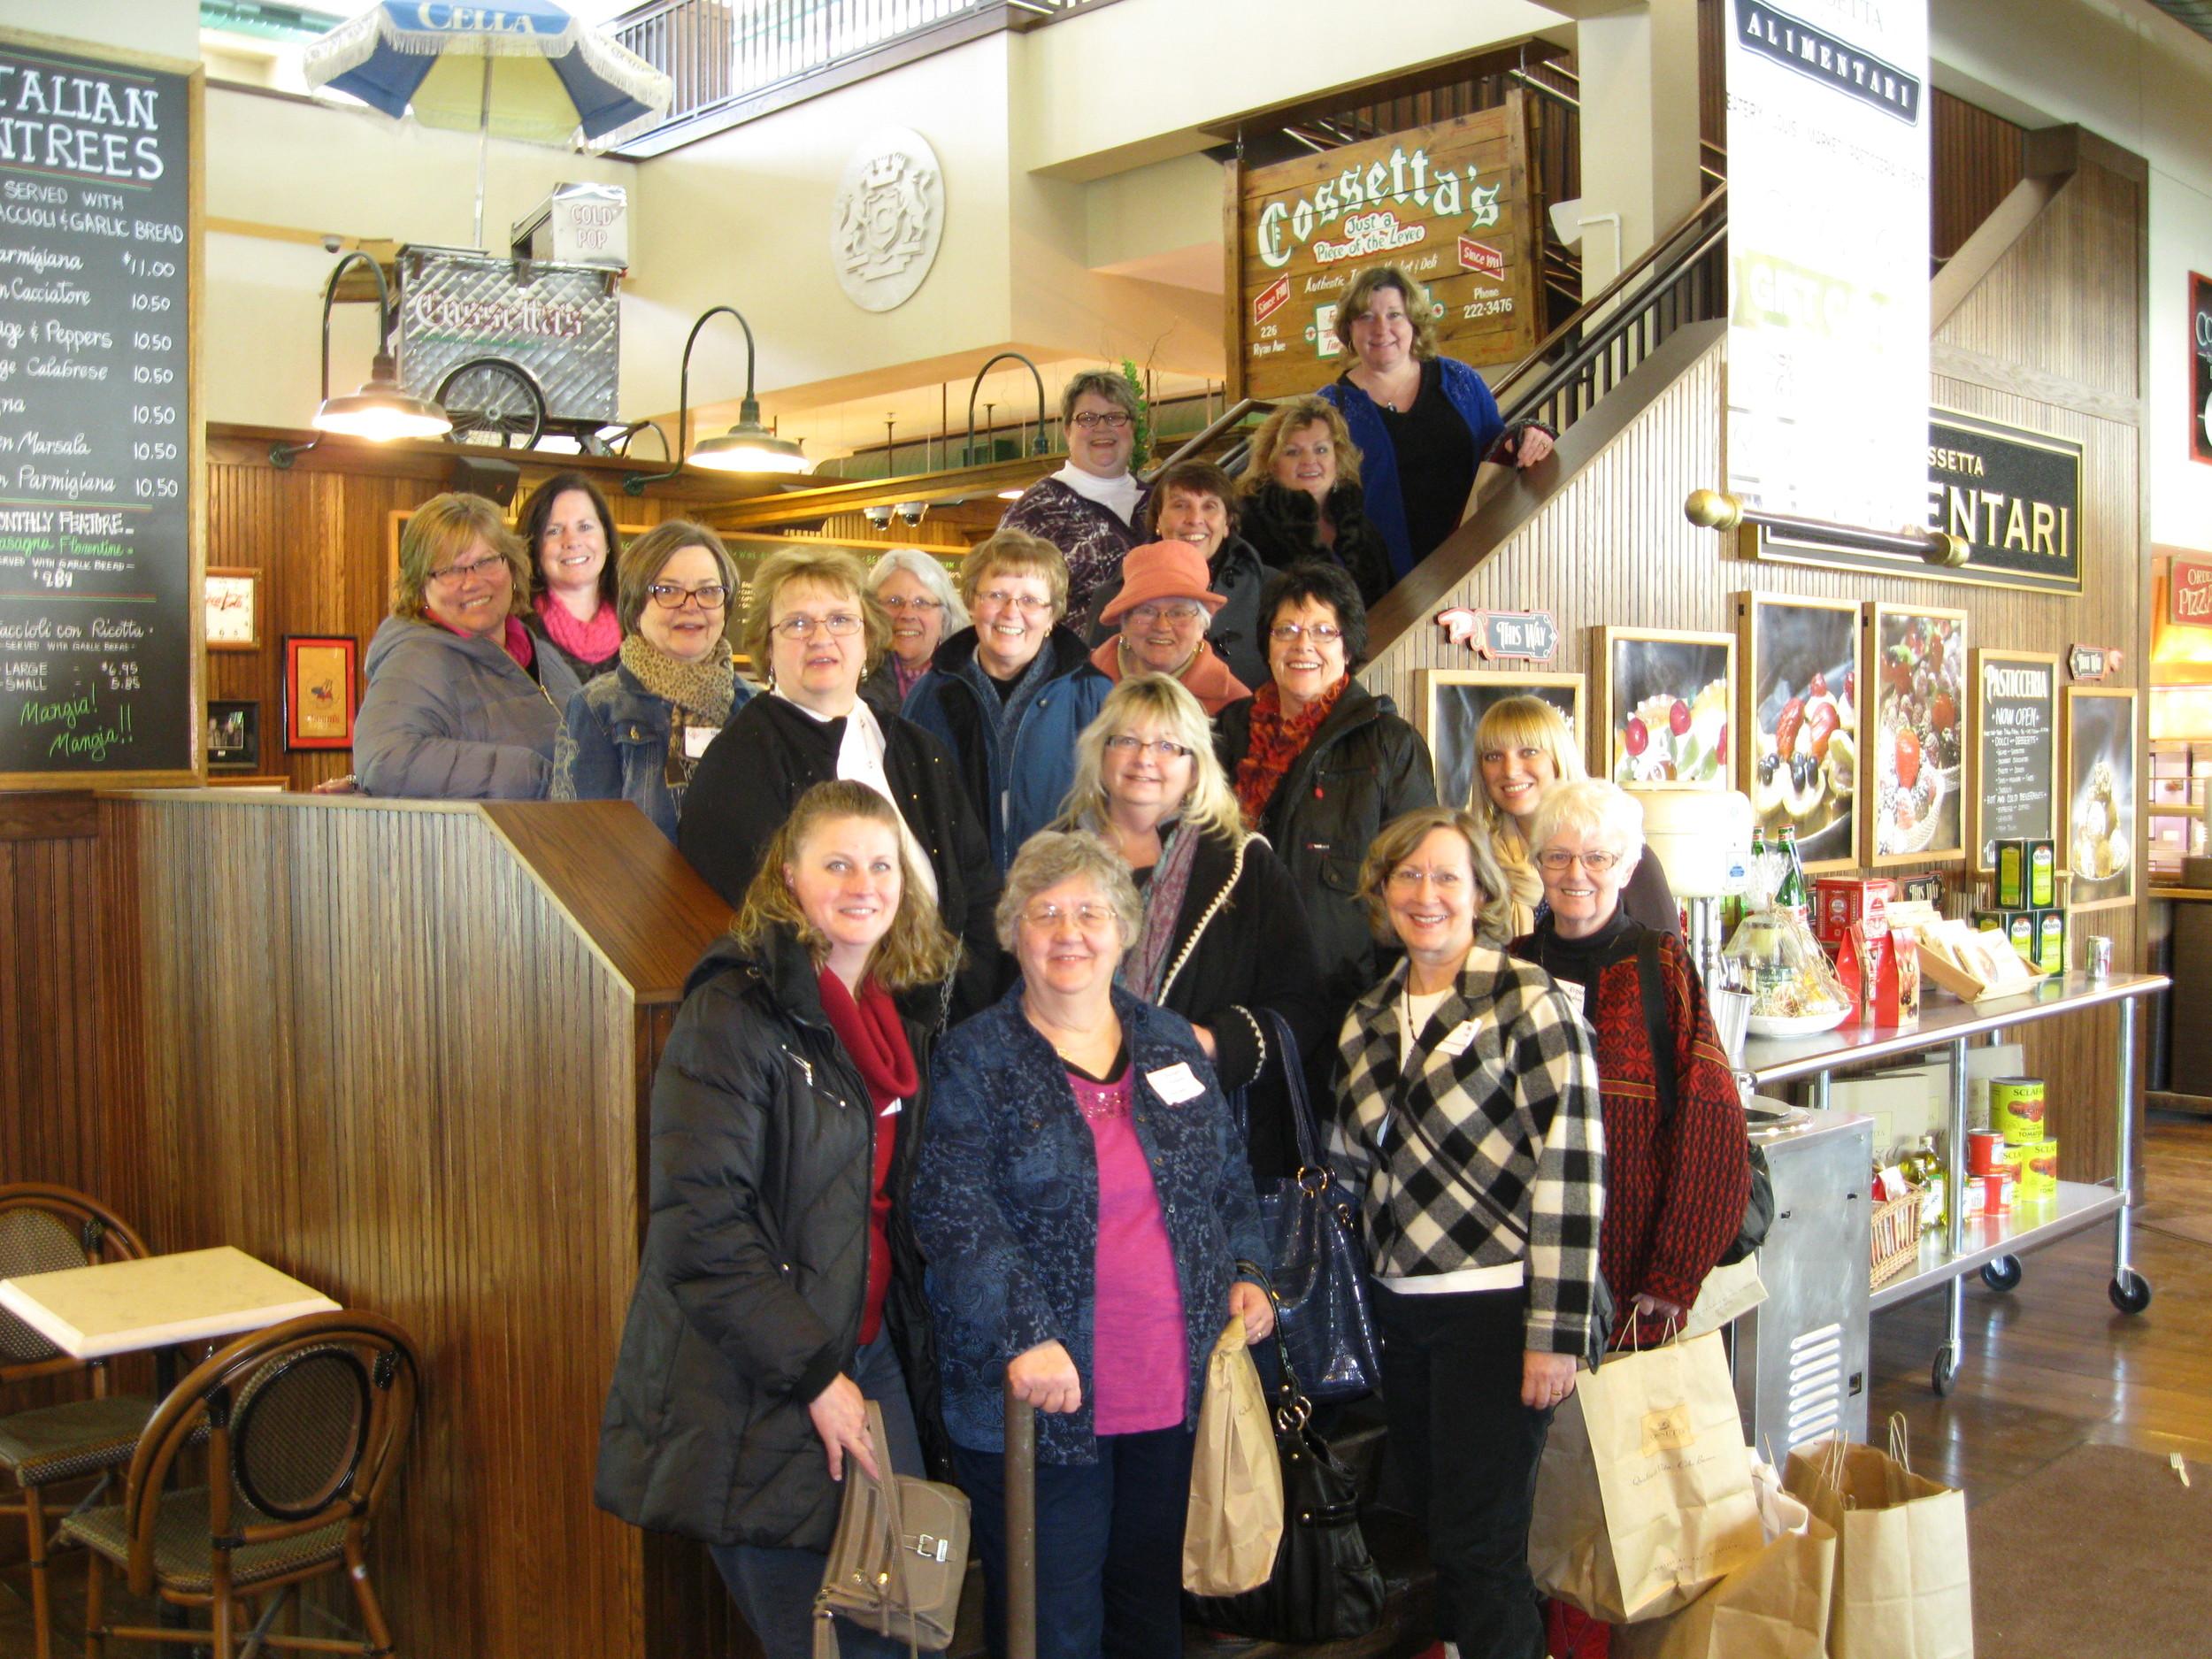 Excursion Participants enjoy lunch at Cossetta's in downtown Saint Paul.